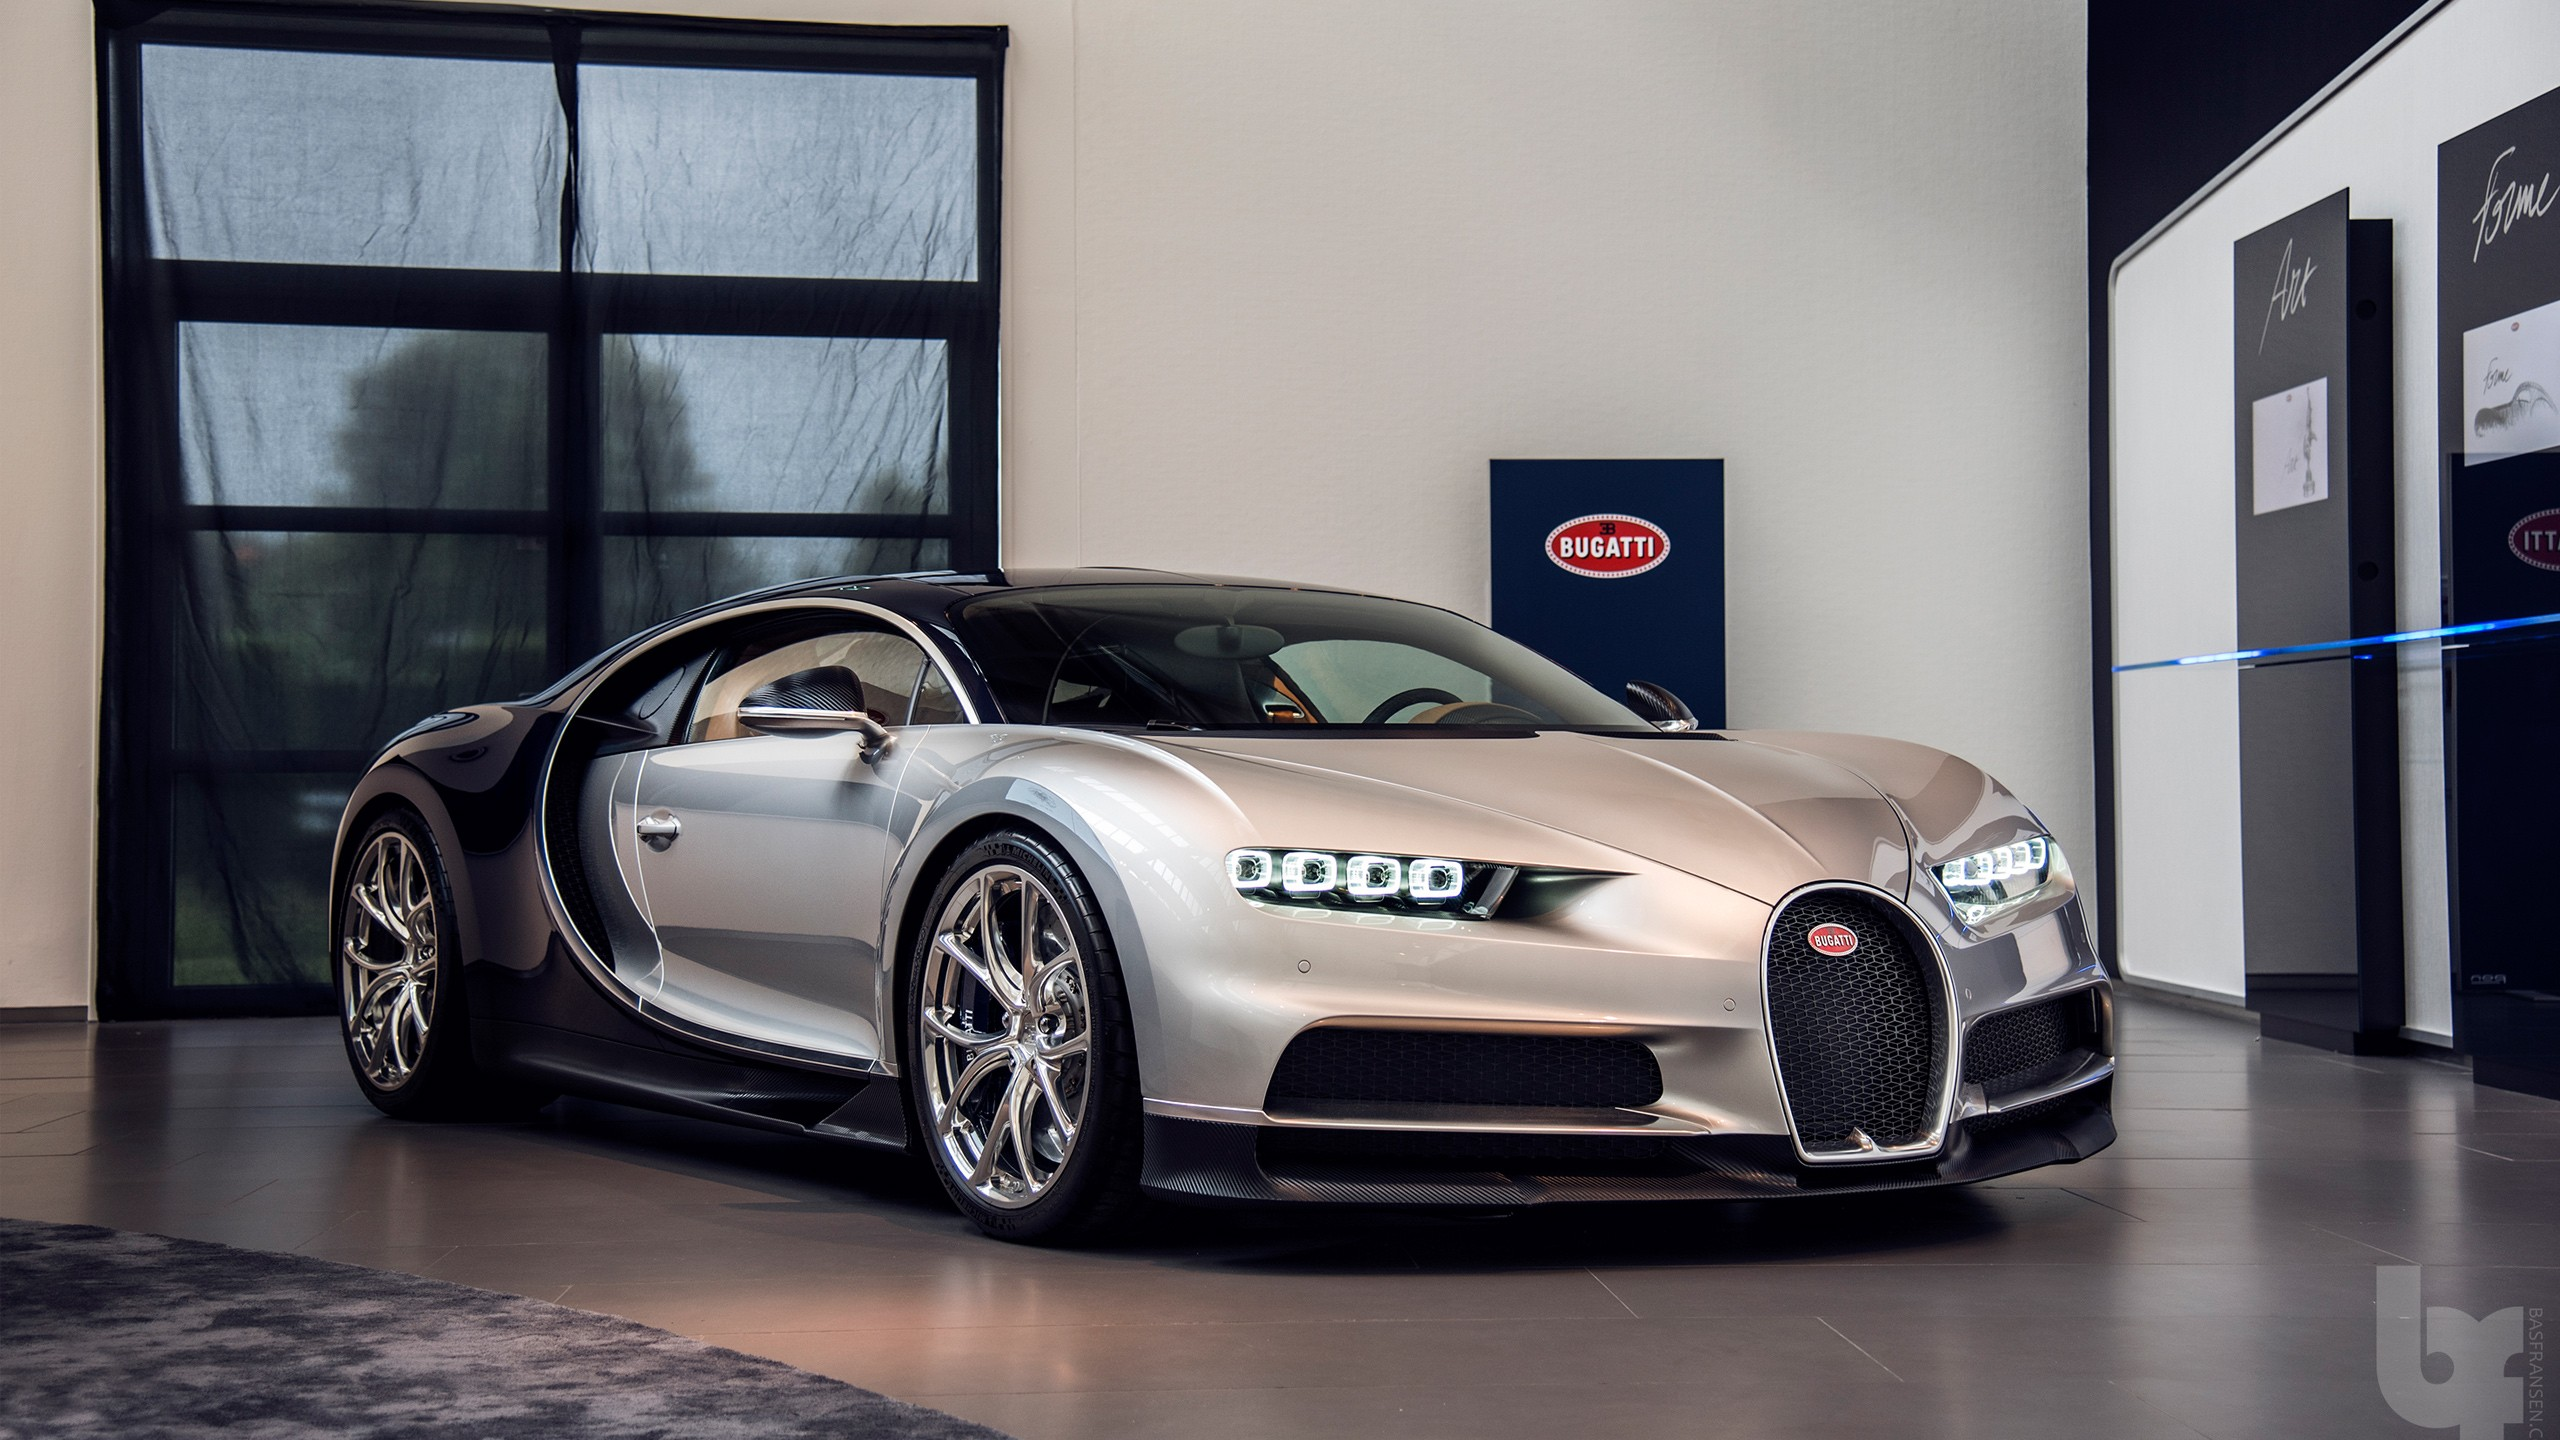 bugatti chiron most expensive car wallpaper hd car. Black Bedroom Furniture Sets. Home Design Ideas